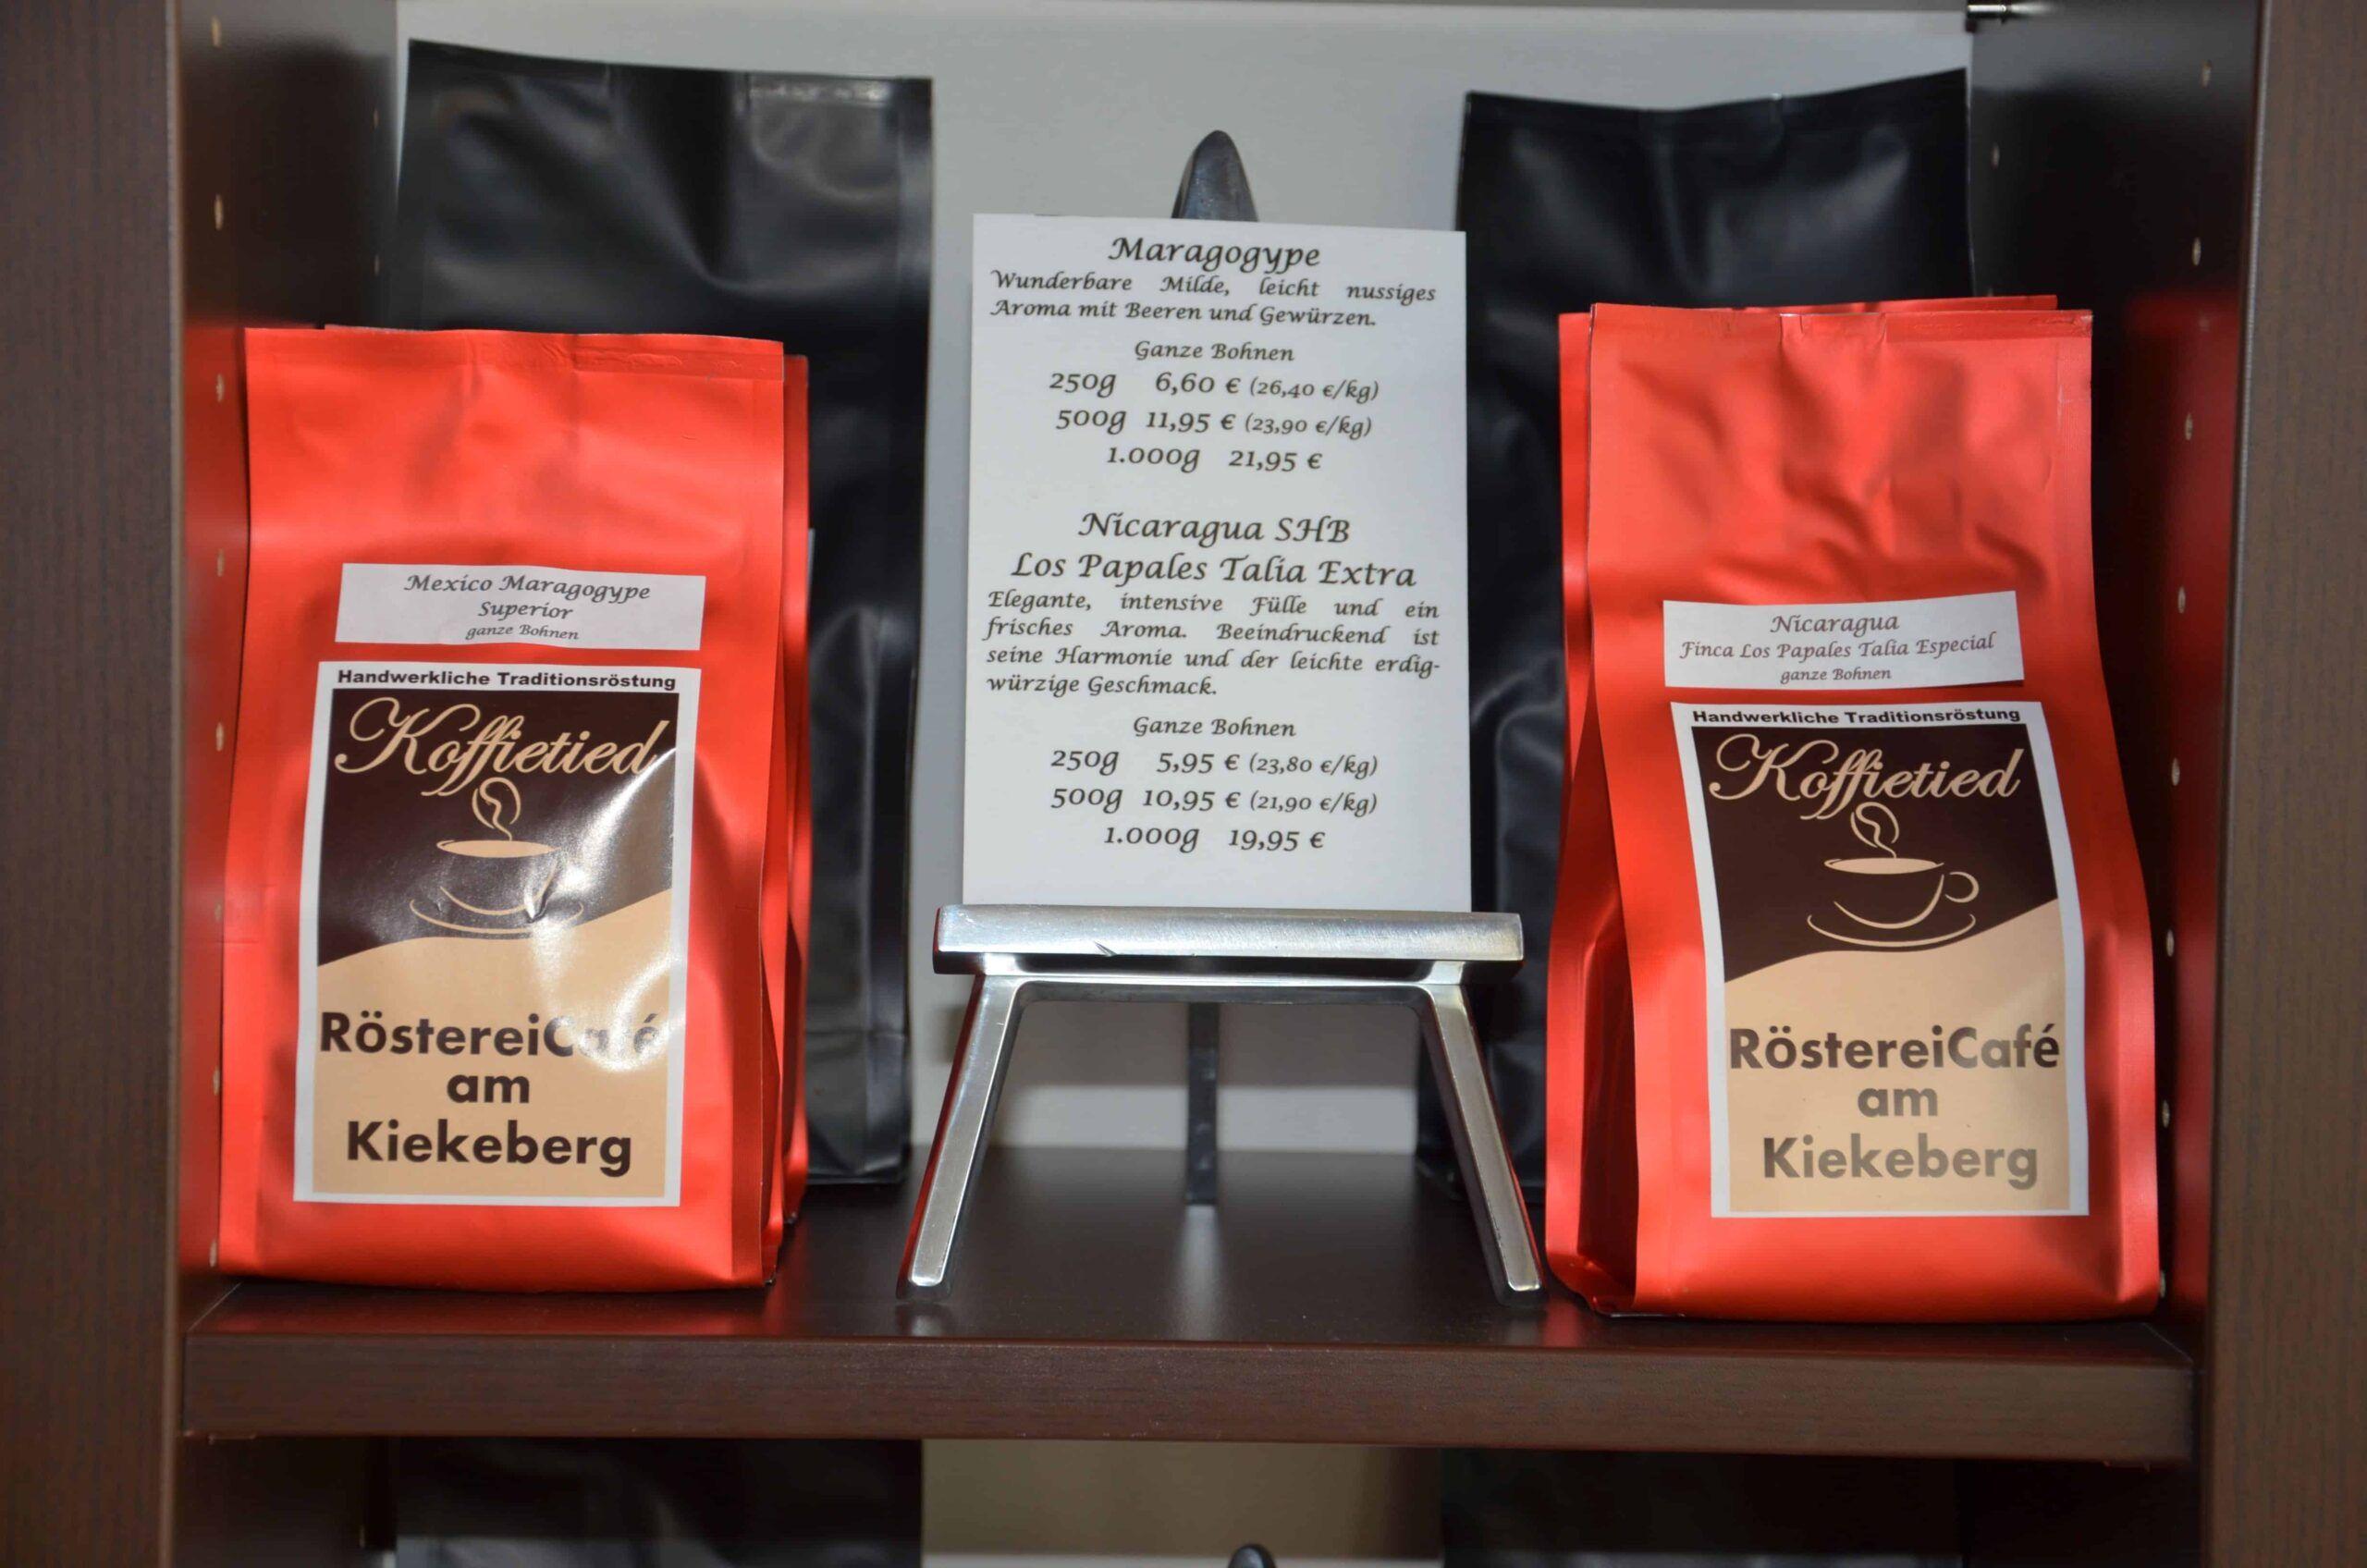 Kaffeerösterei - Koffietied Hausmischung